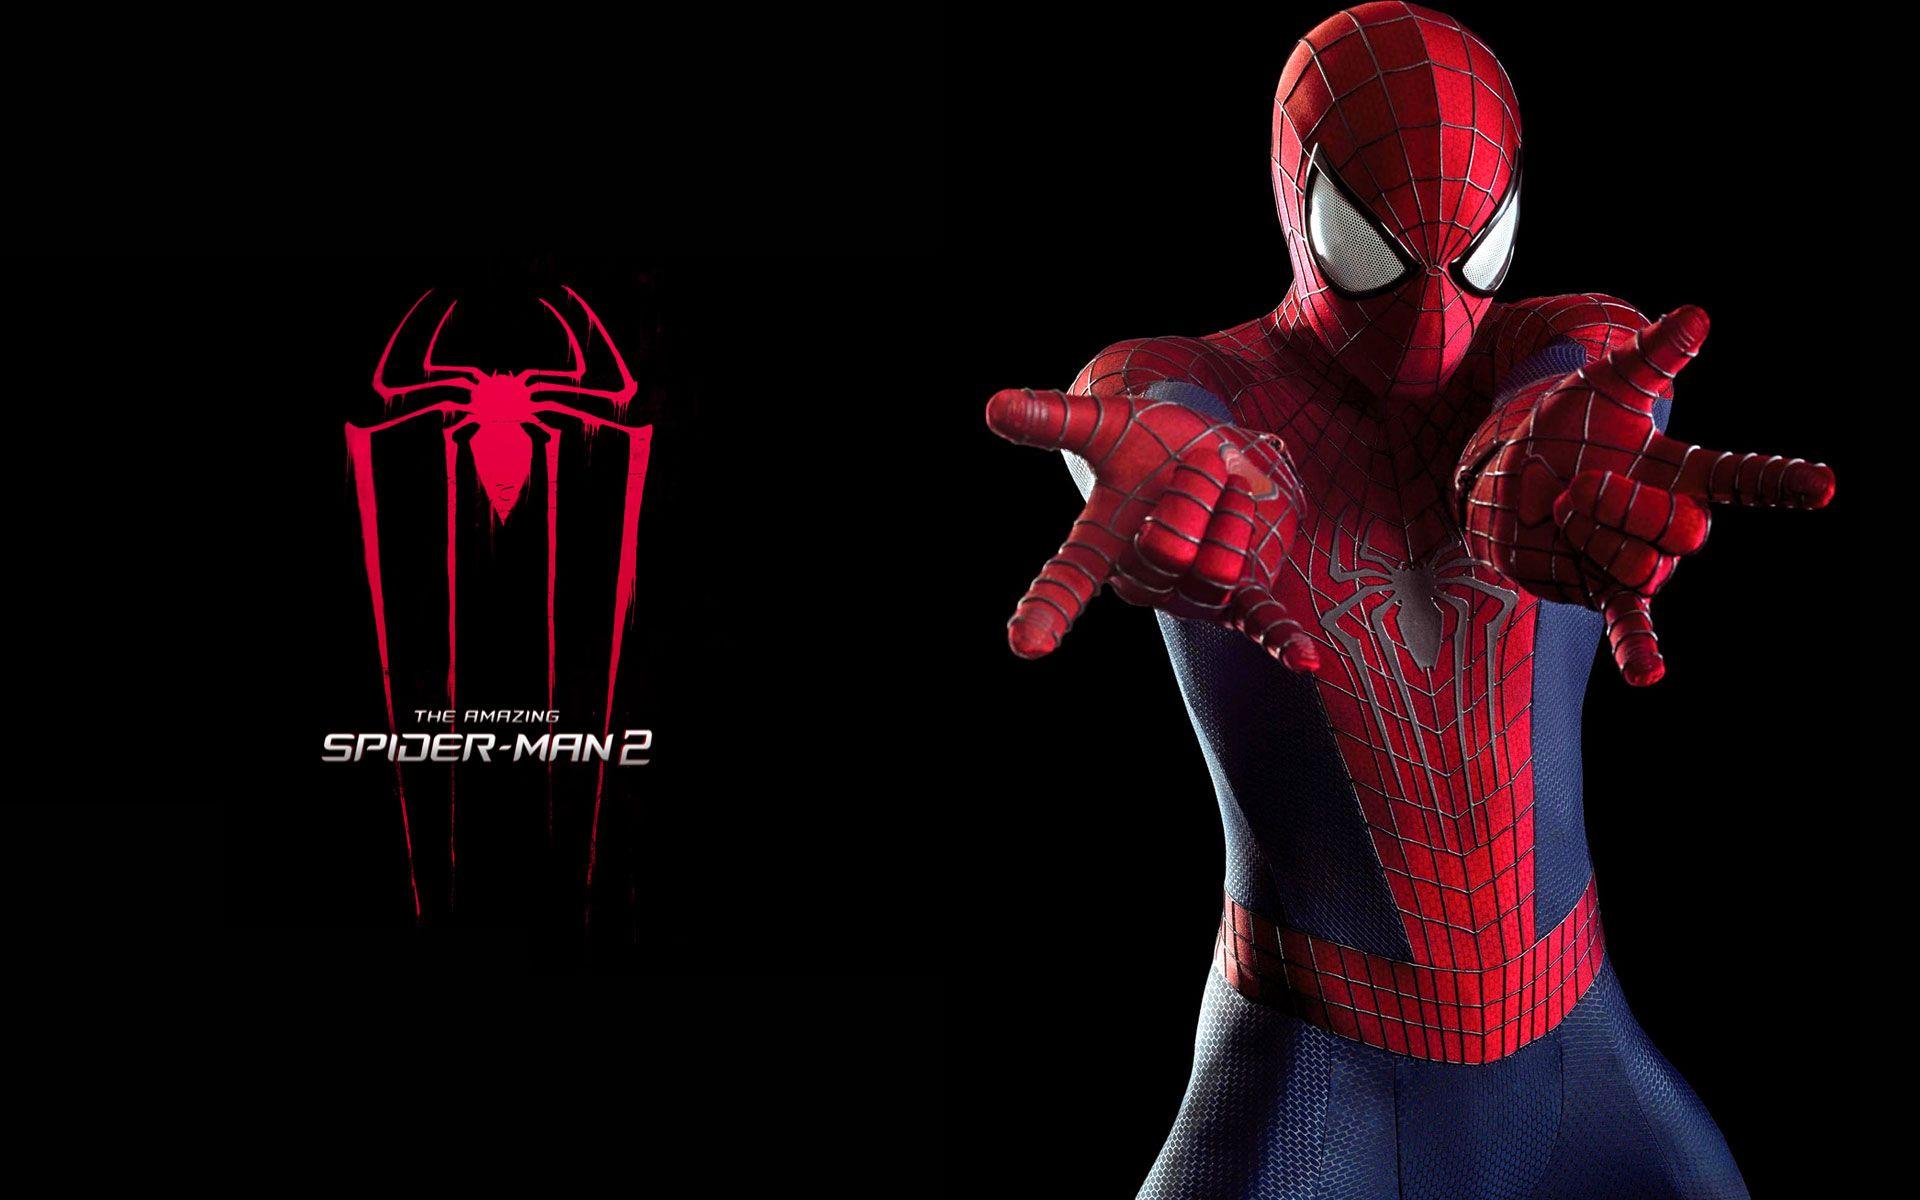 Spiderman Wallpaper Widescreen JnB